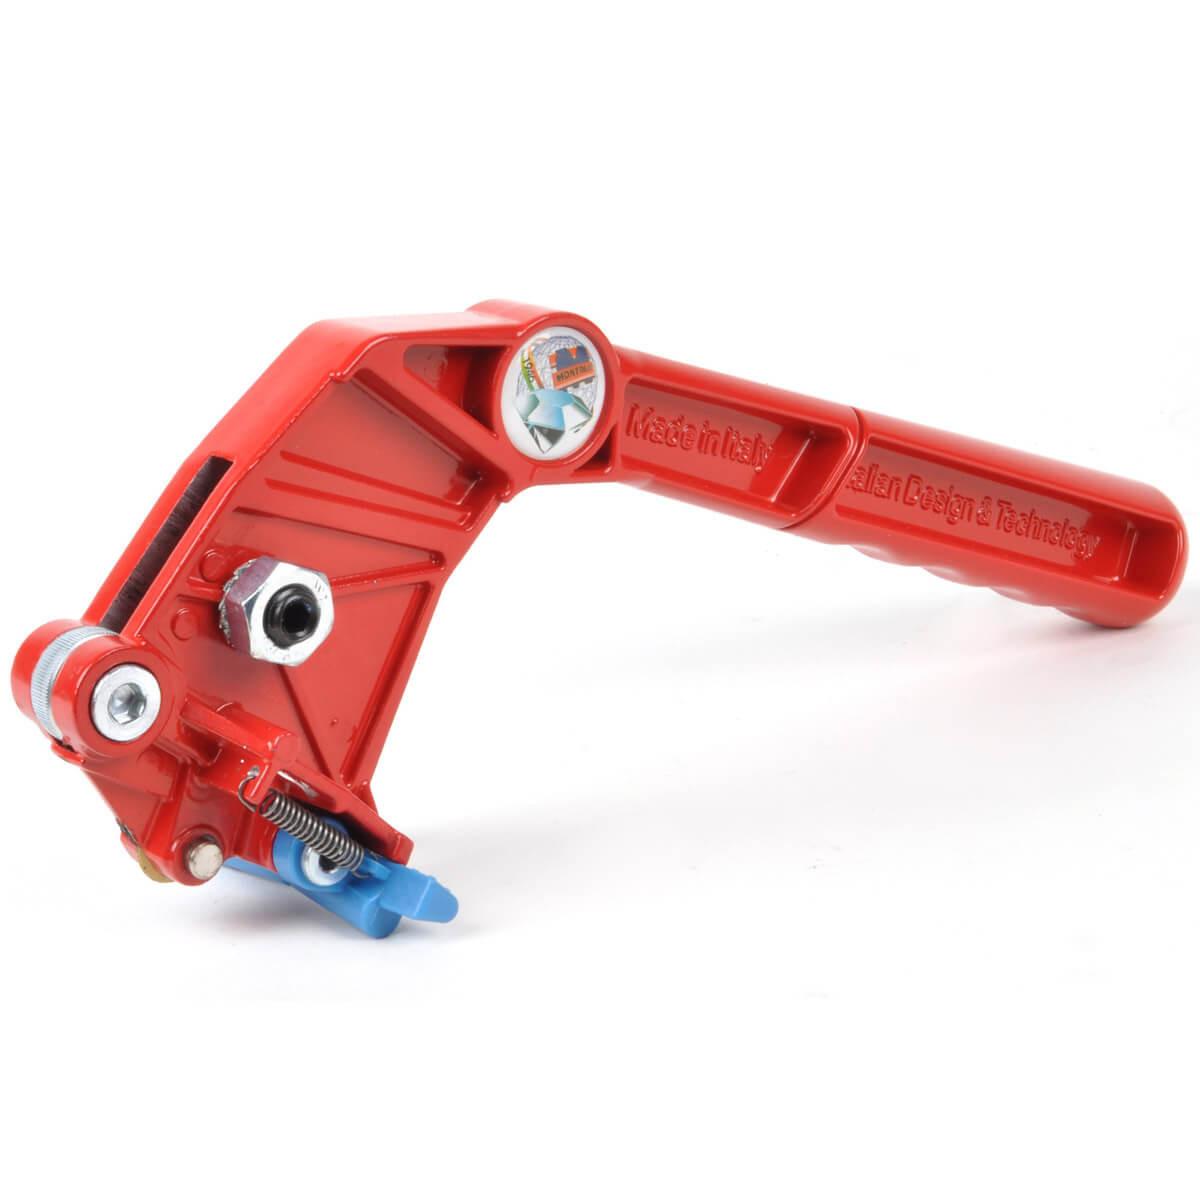 MONTOLIT MINIPIUMA push handle